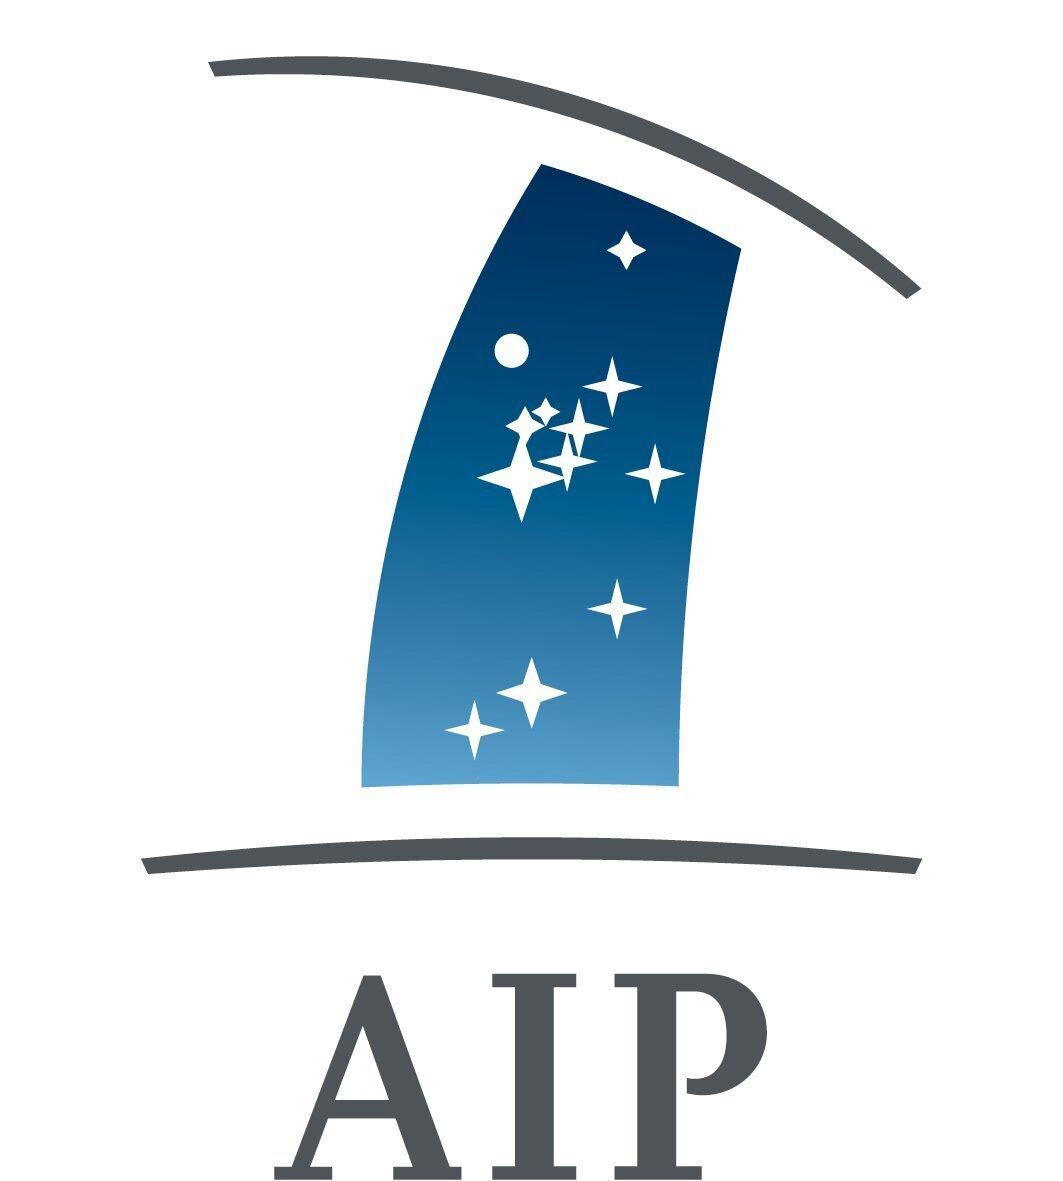 Leibniz-Institut für Astrophysik Potsdam